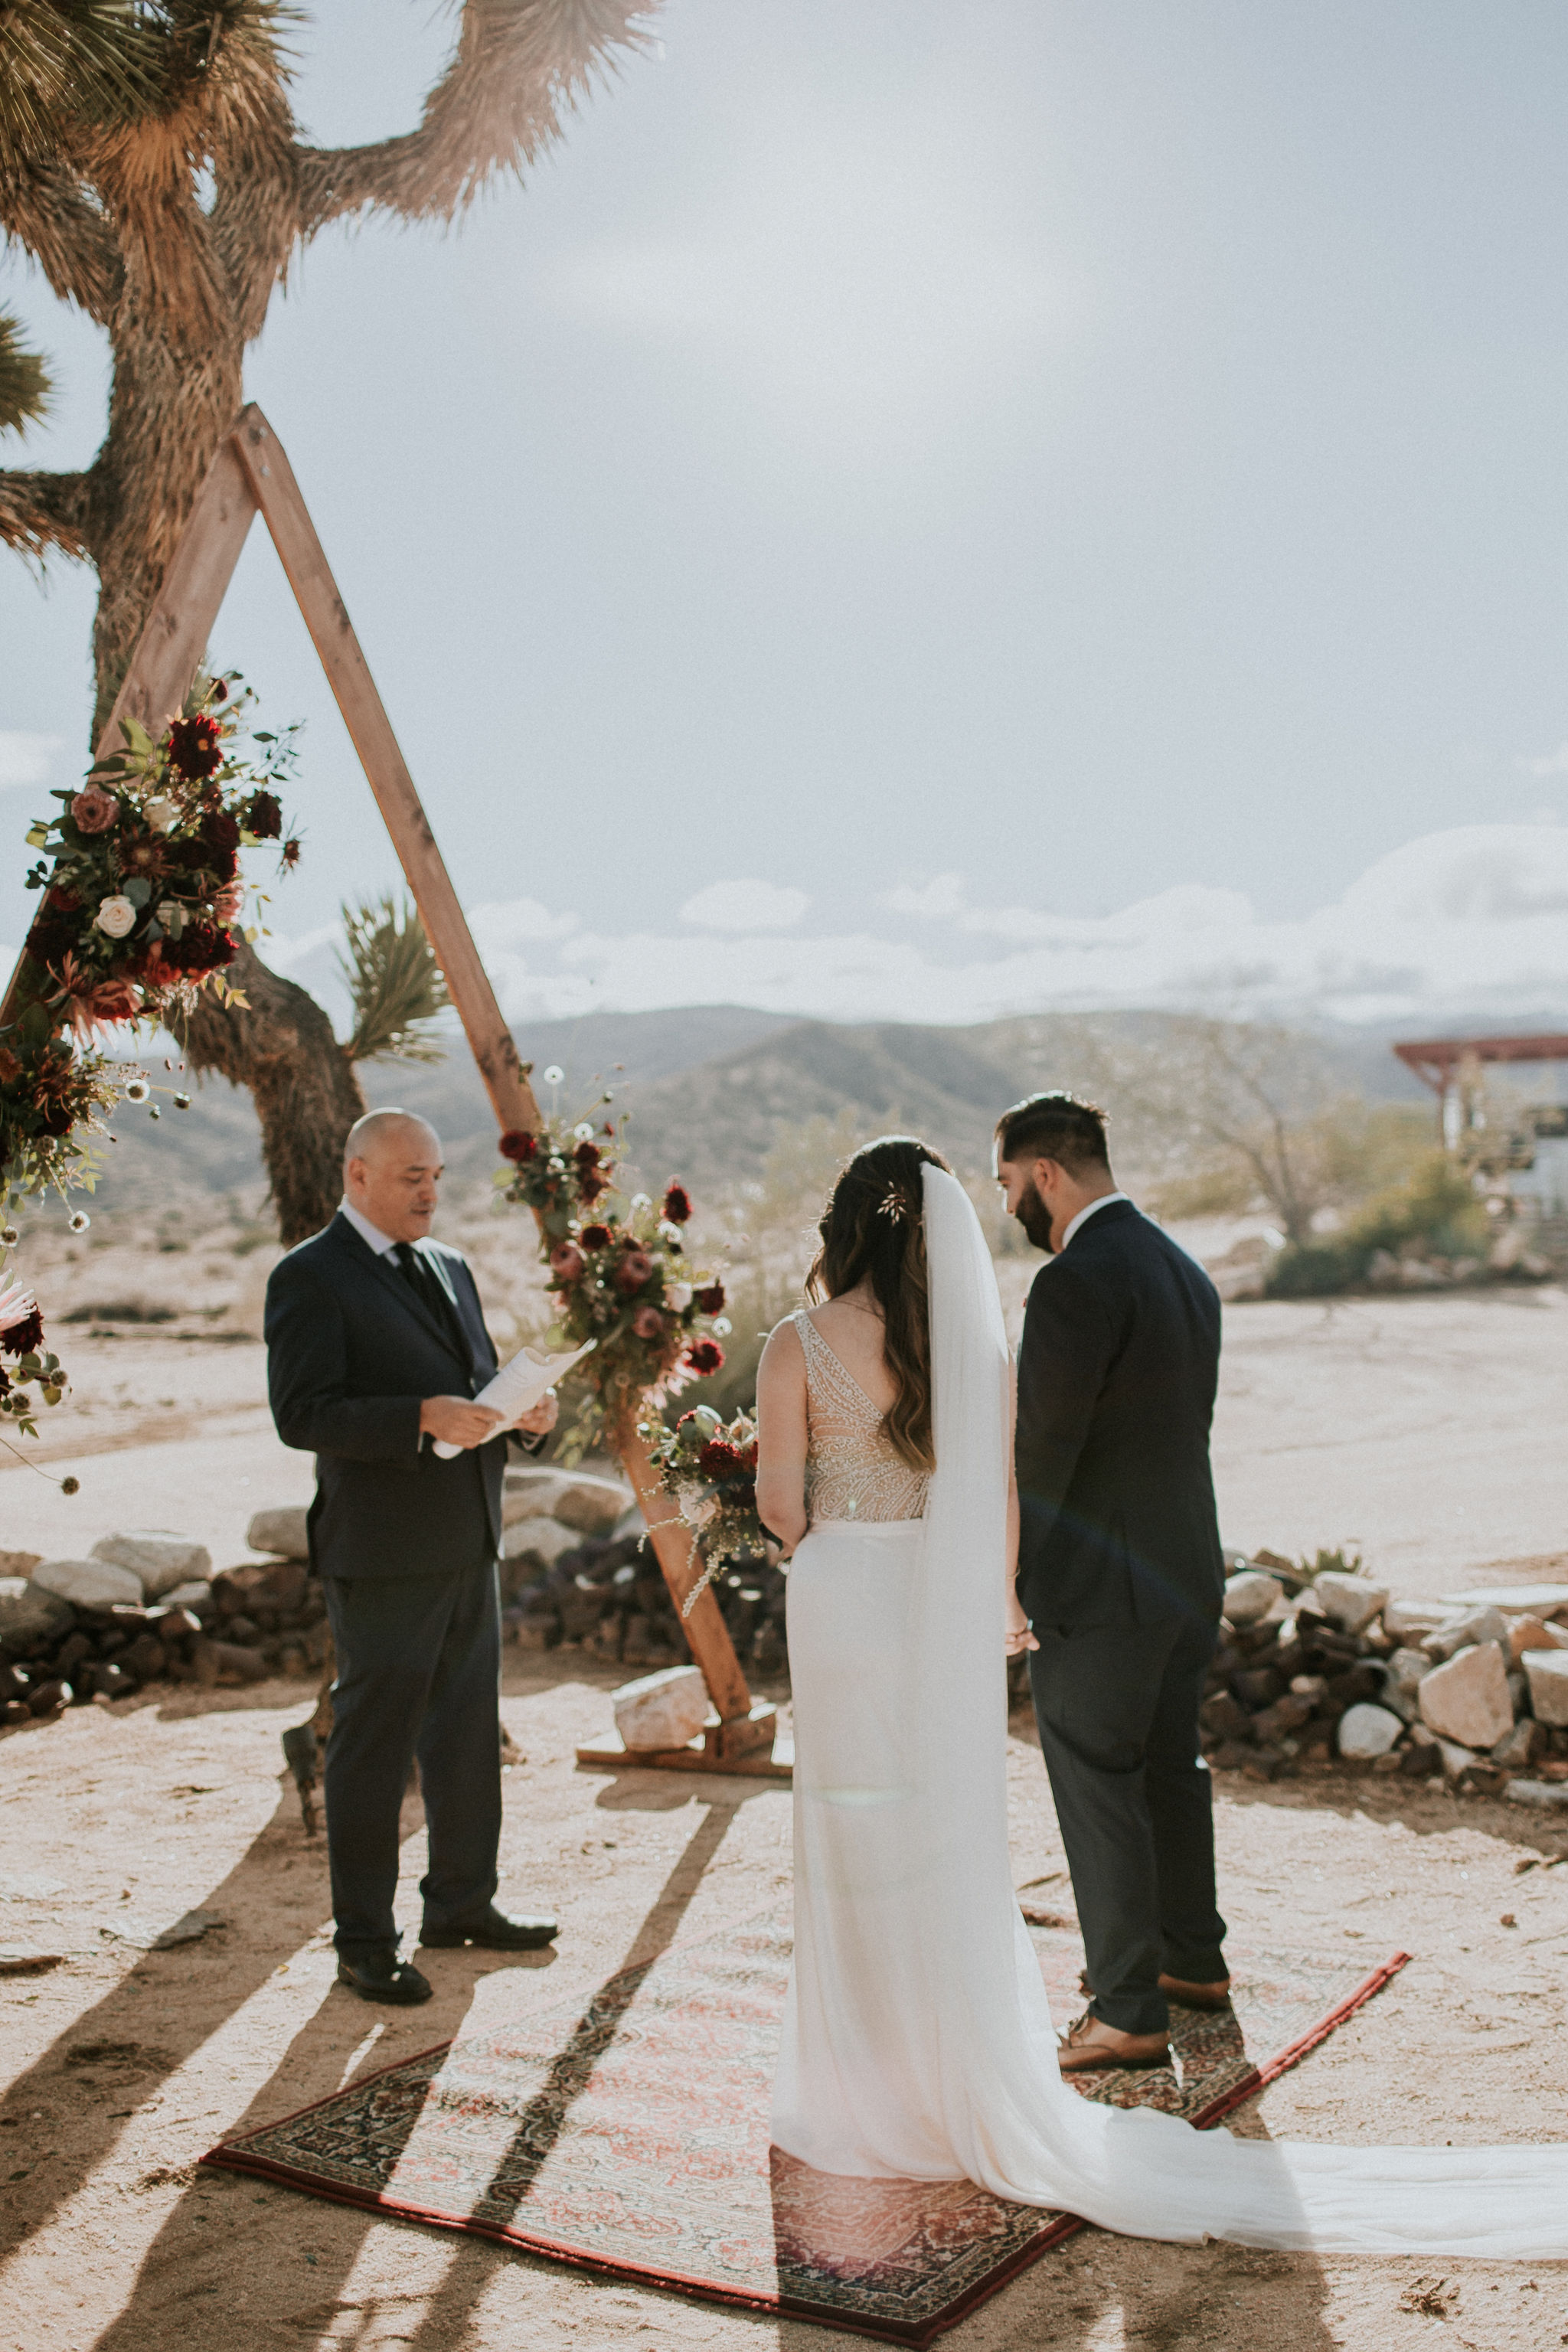 RimrockRanch-JoshuaTree-Wedding-Jami-Laree-313.jpg